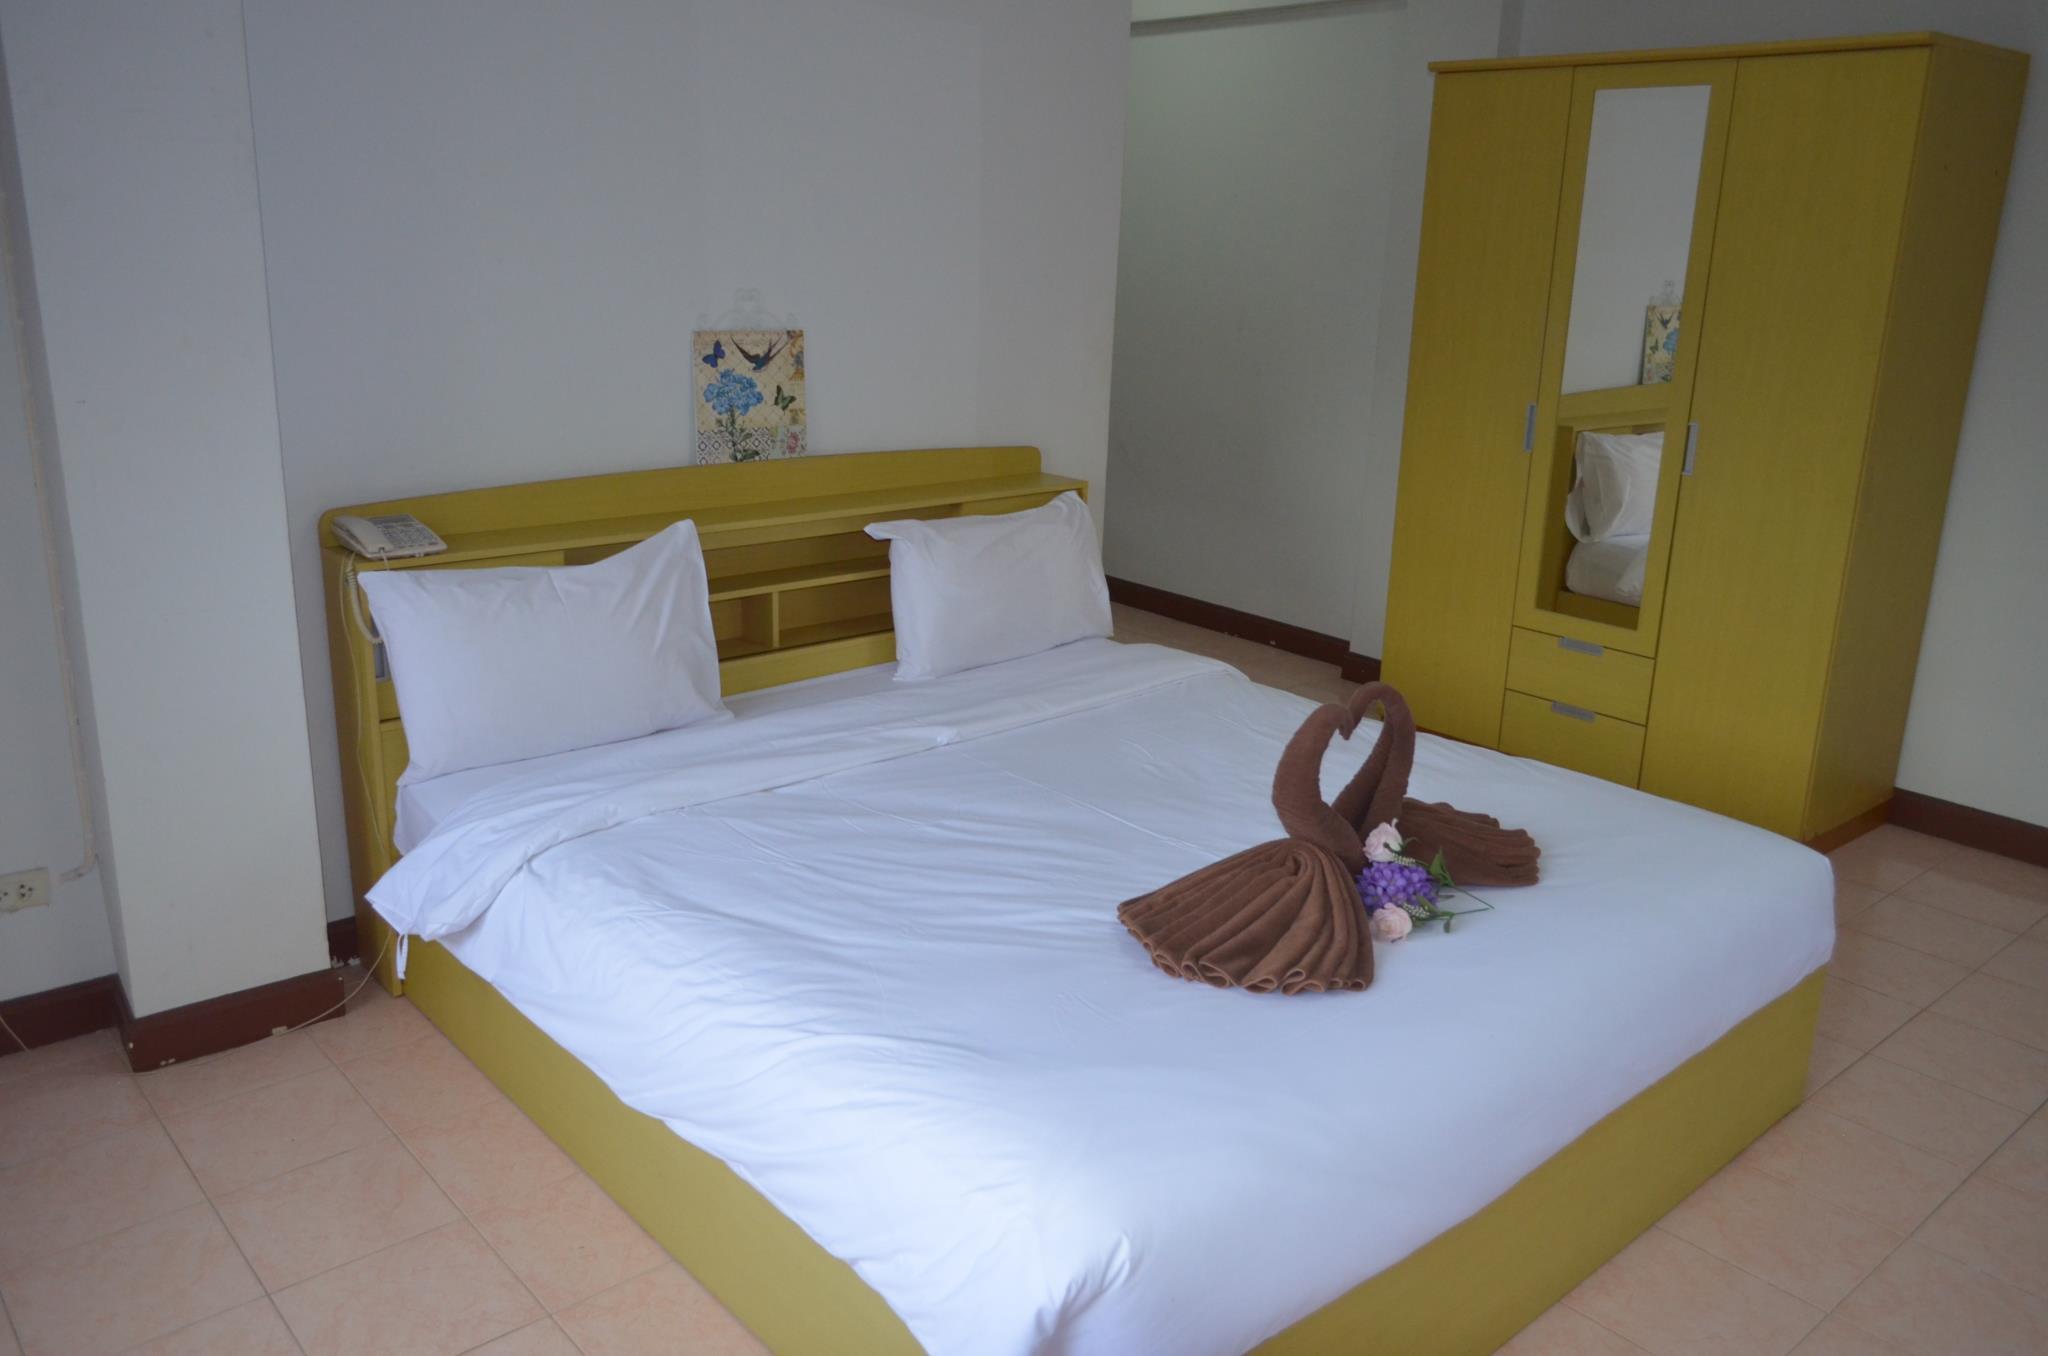 Premier Hotel Nakhonsrithammarat,โรงแรมพรีเมียร์ นครศรีธรรมราช